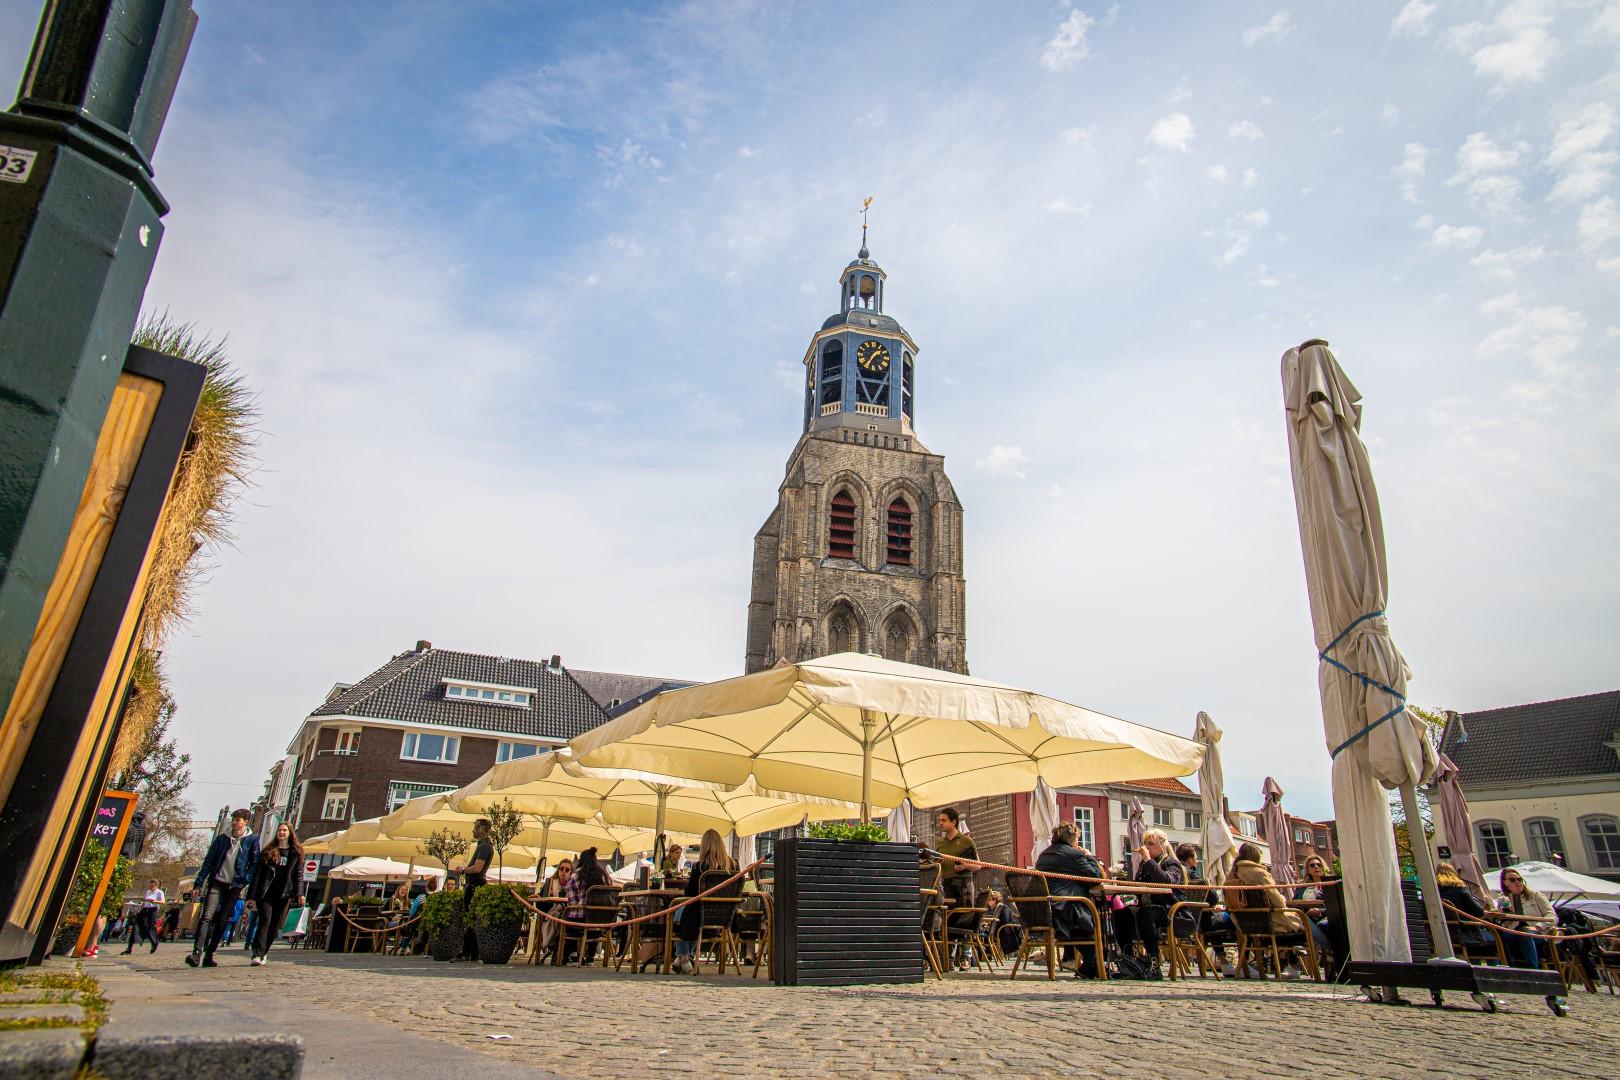 grote markt terras terrassen peperbus horeca binnenstad